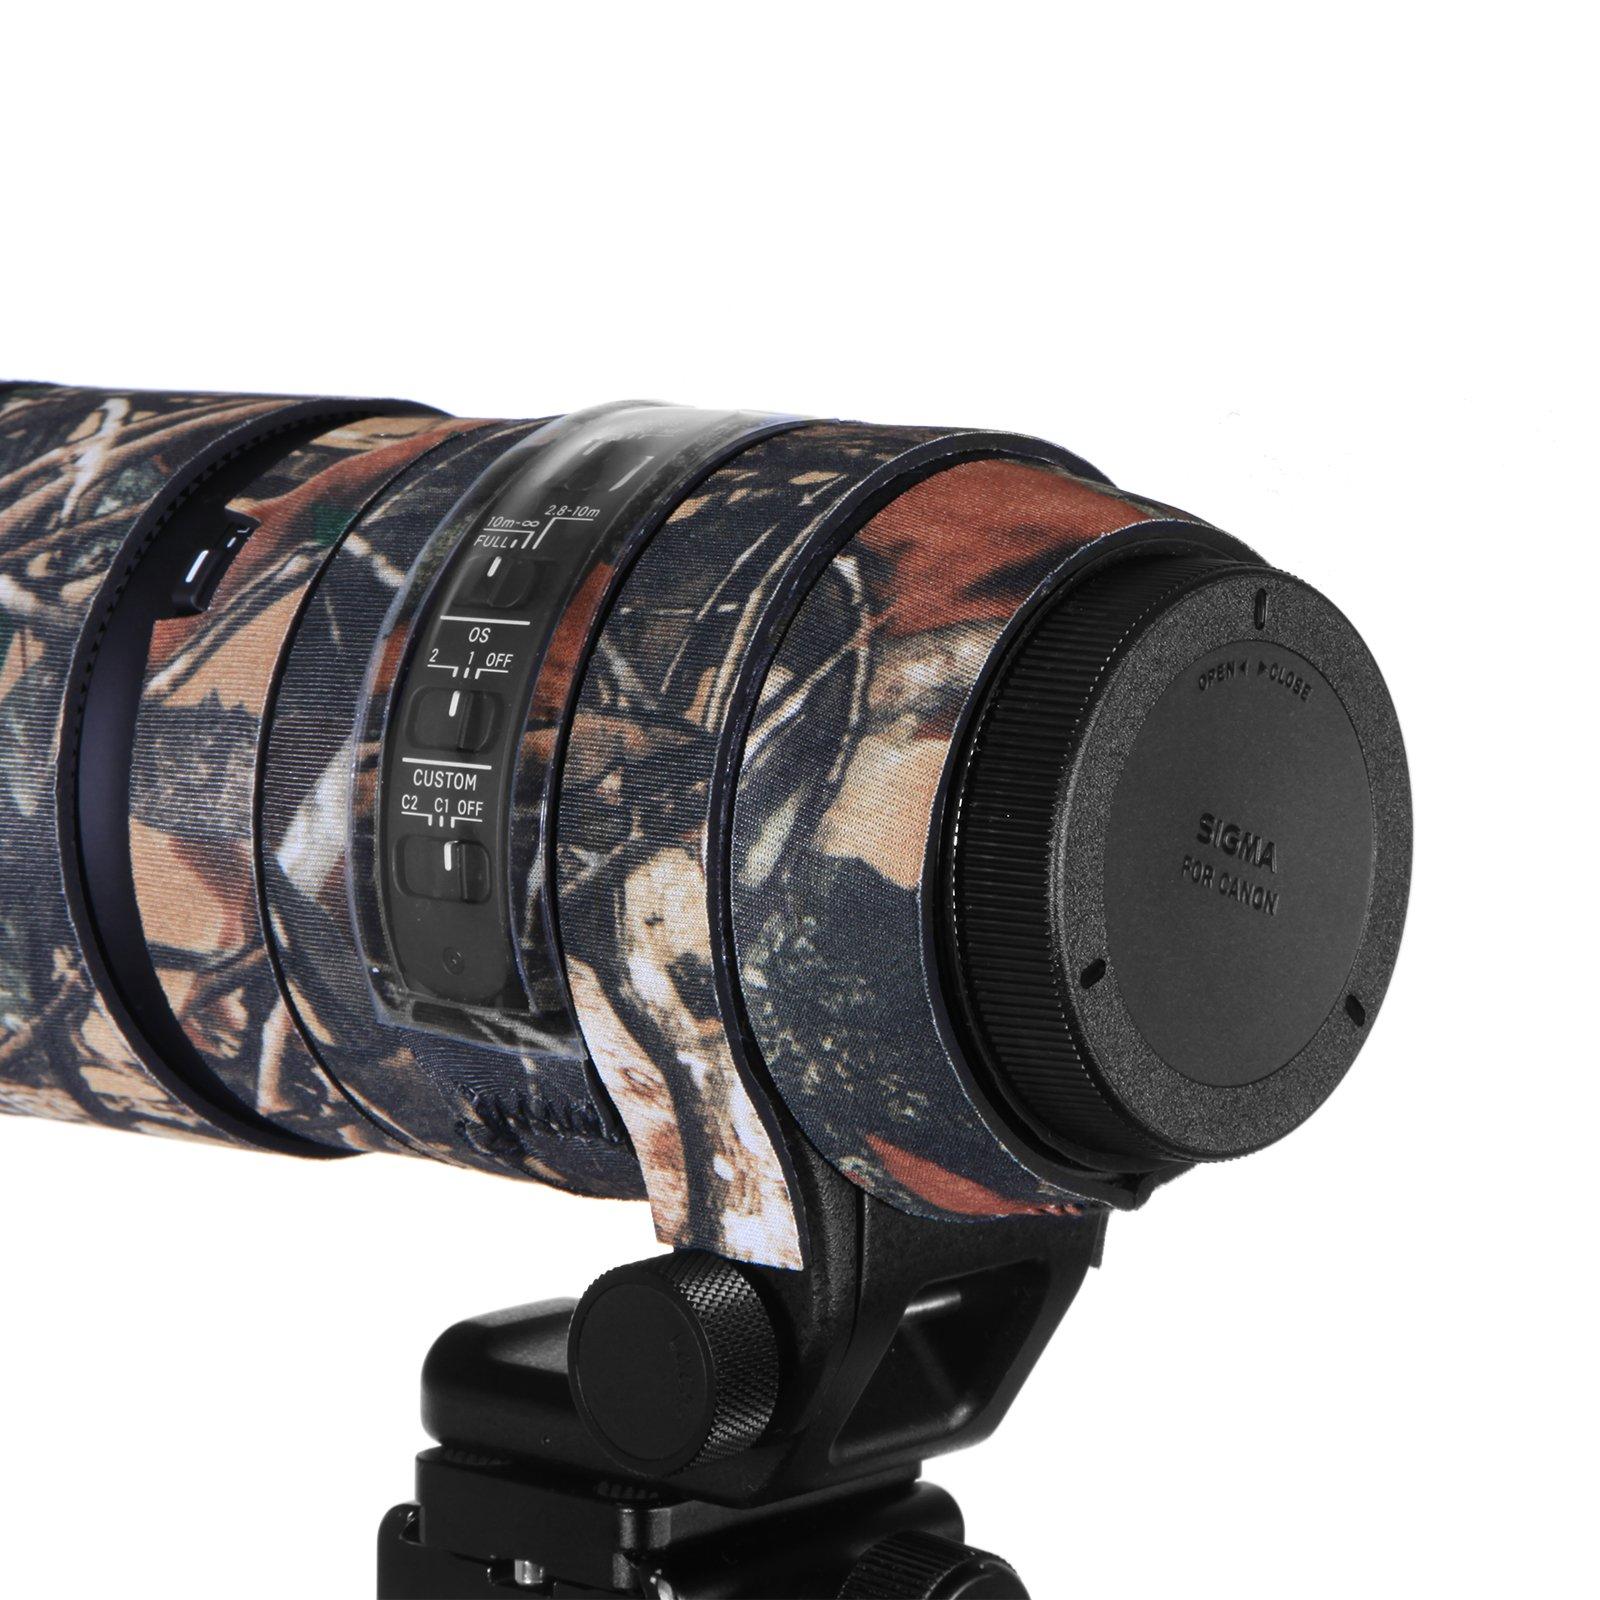 Mekingstudio Camera Lens Cover Protective for Sigma 150-600mm C - Forest Green Camo by Mekingstudio (Image #2)